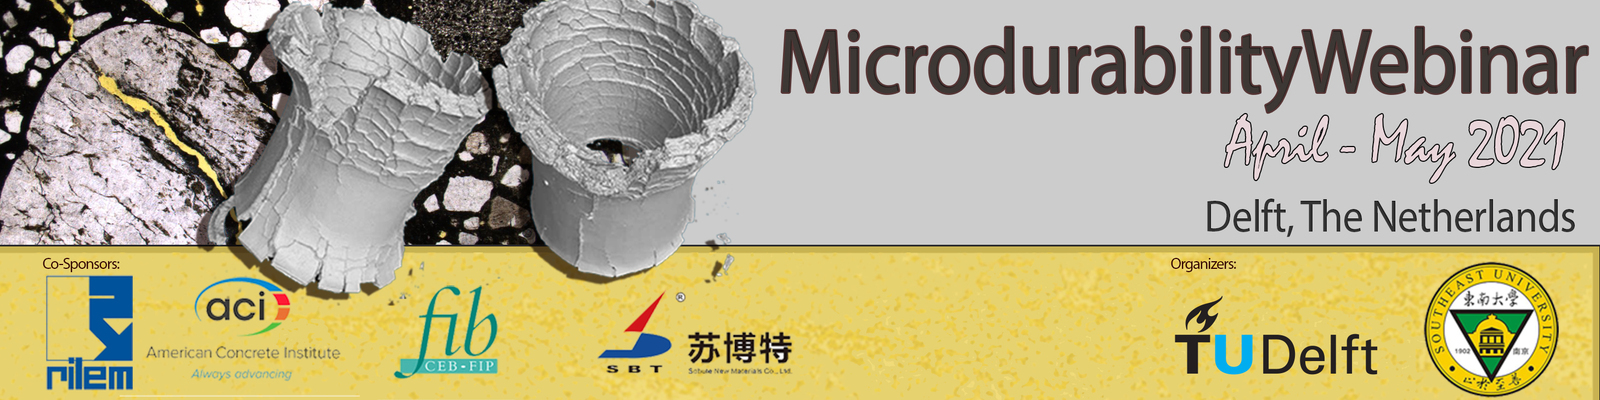 Microdurability 2020